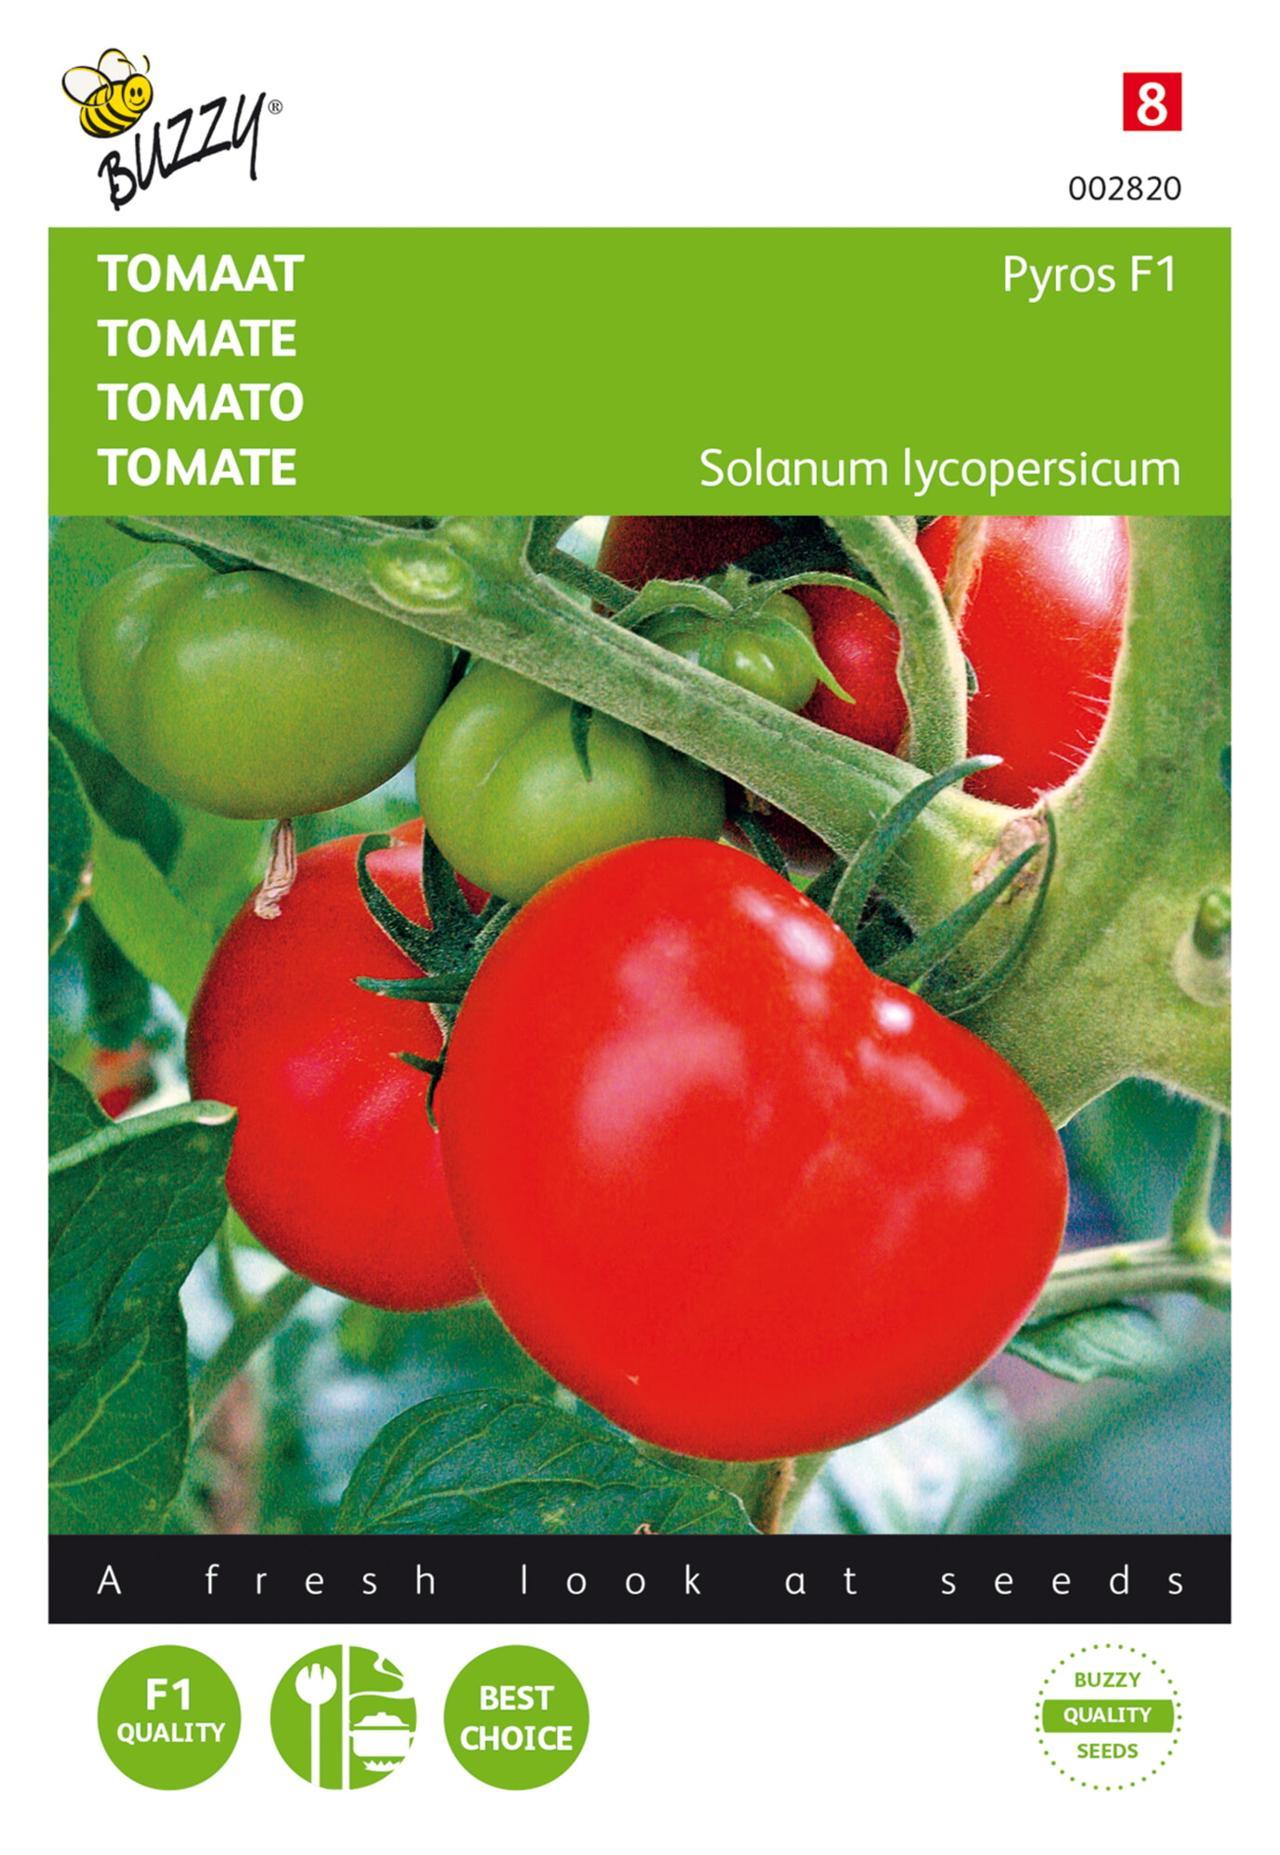 Solanum lycopersicum 'Pyros F1' plant